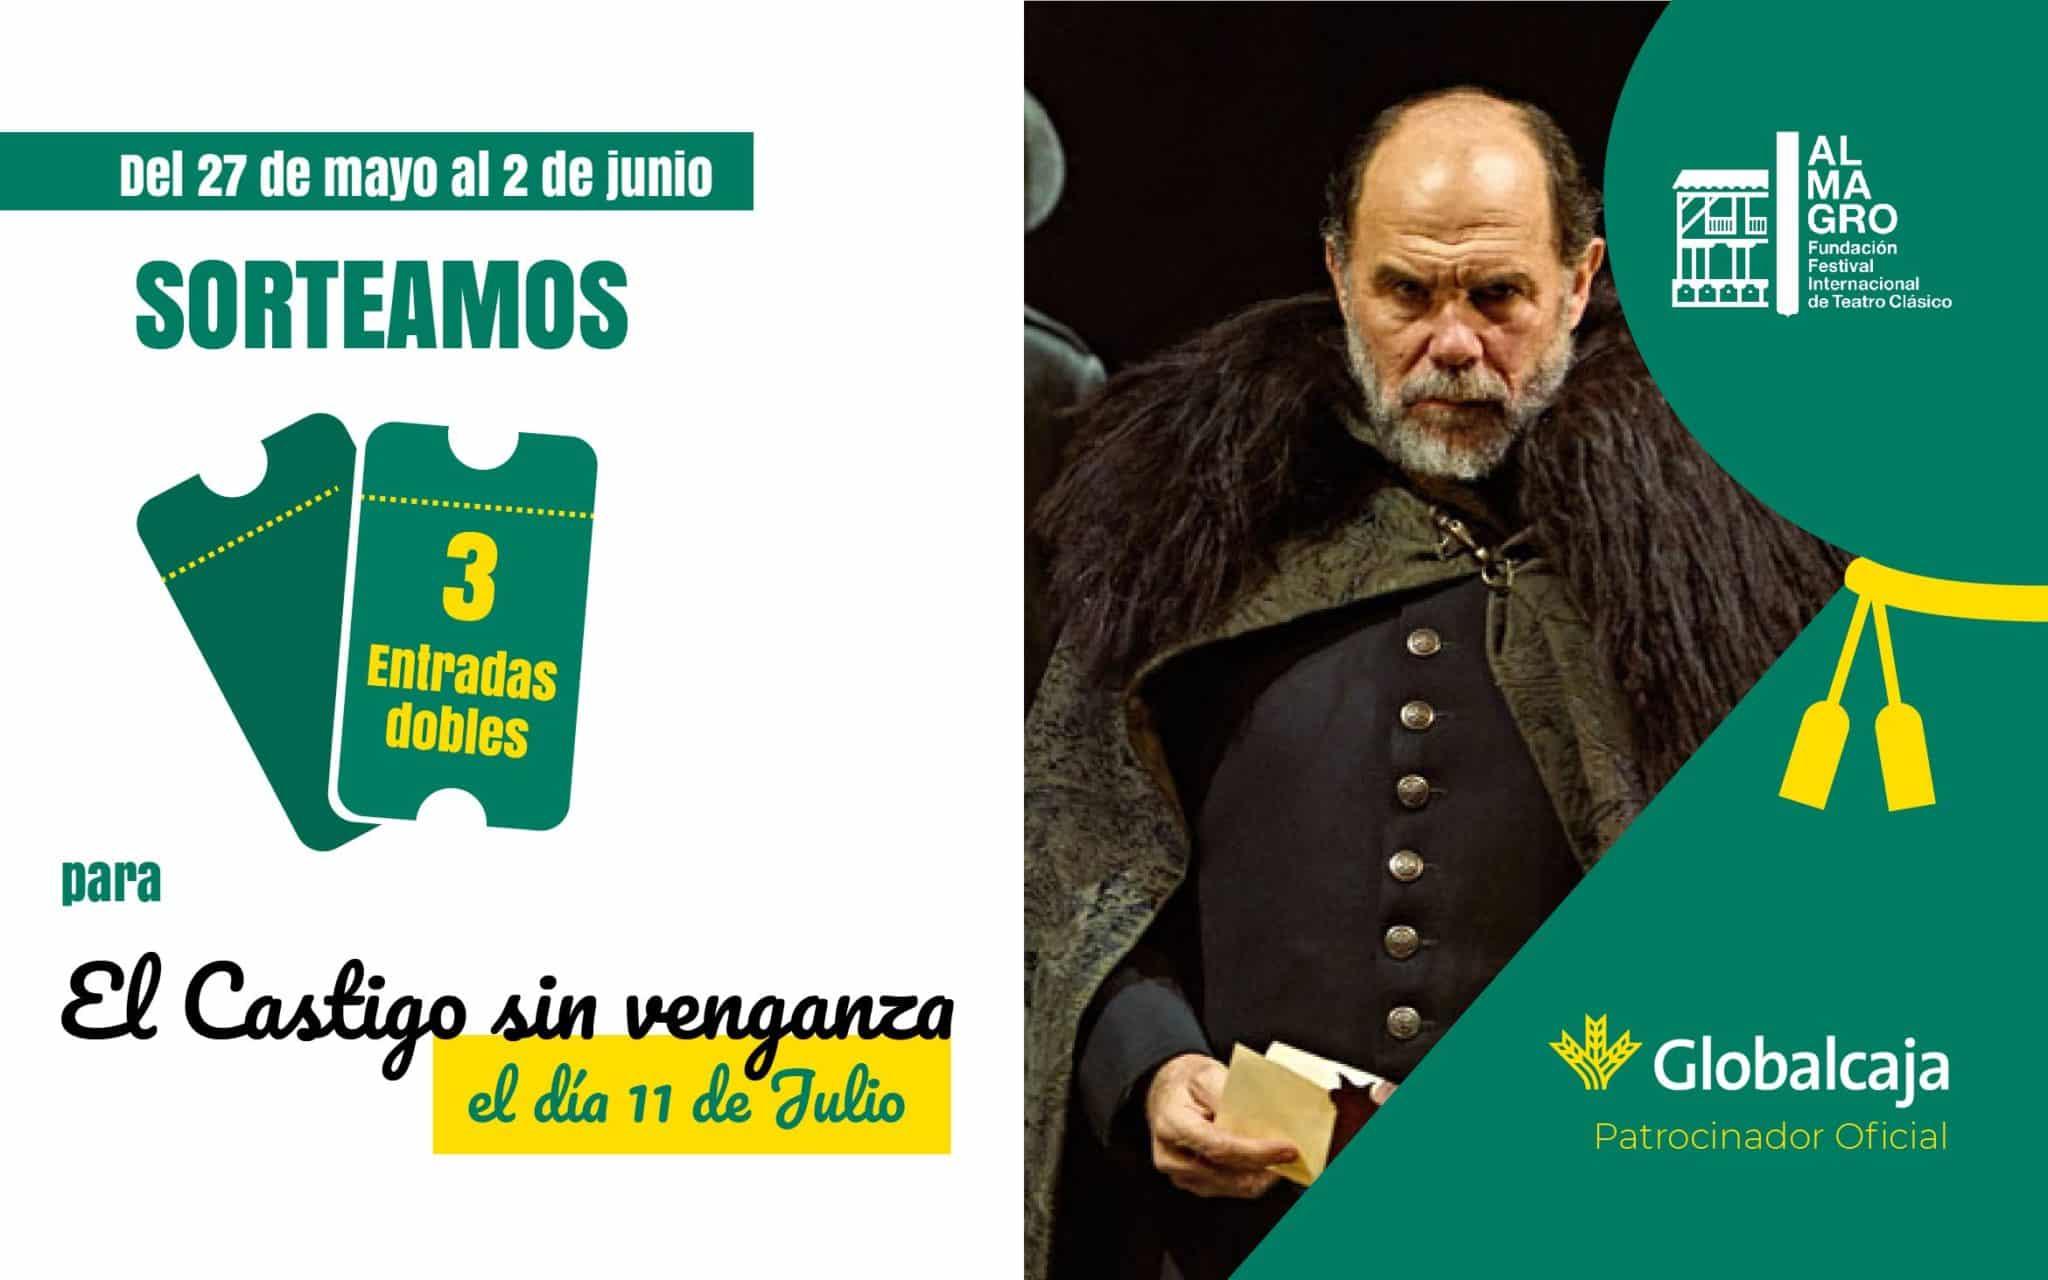 https://blog.globalcaja.es/wp-content/uploads/2019/05/Sorteo-3-entradas-el-castigo-sin-venganza-del-11-de-julio-1.jpg